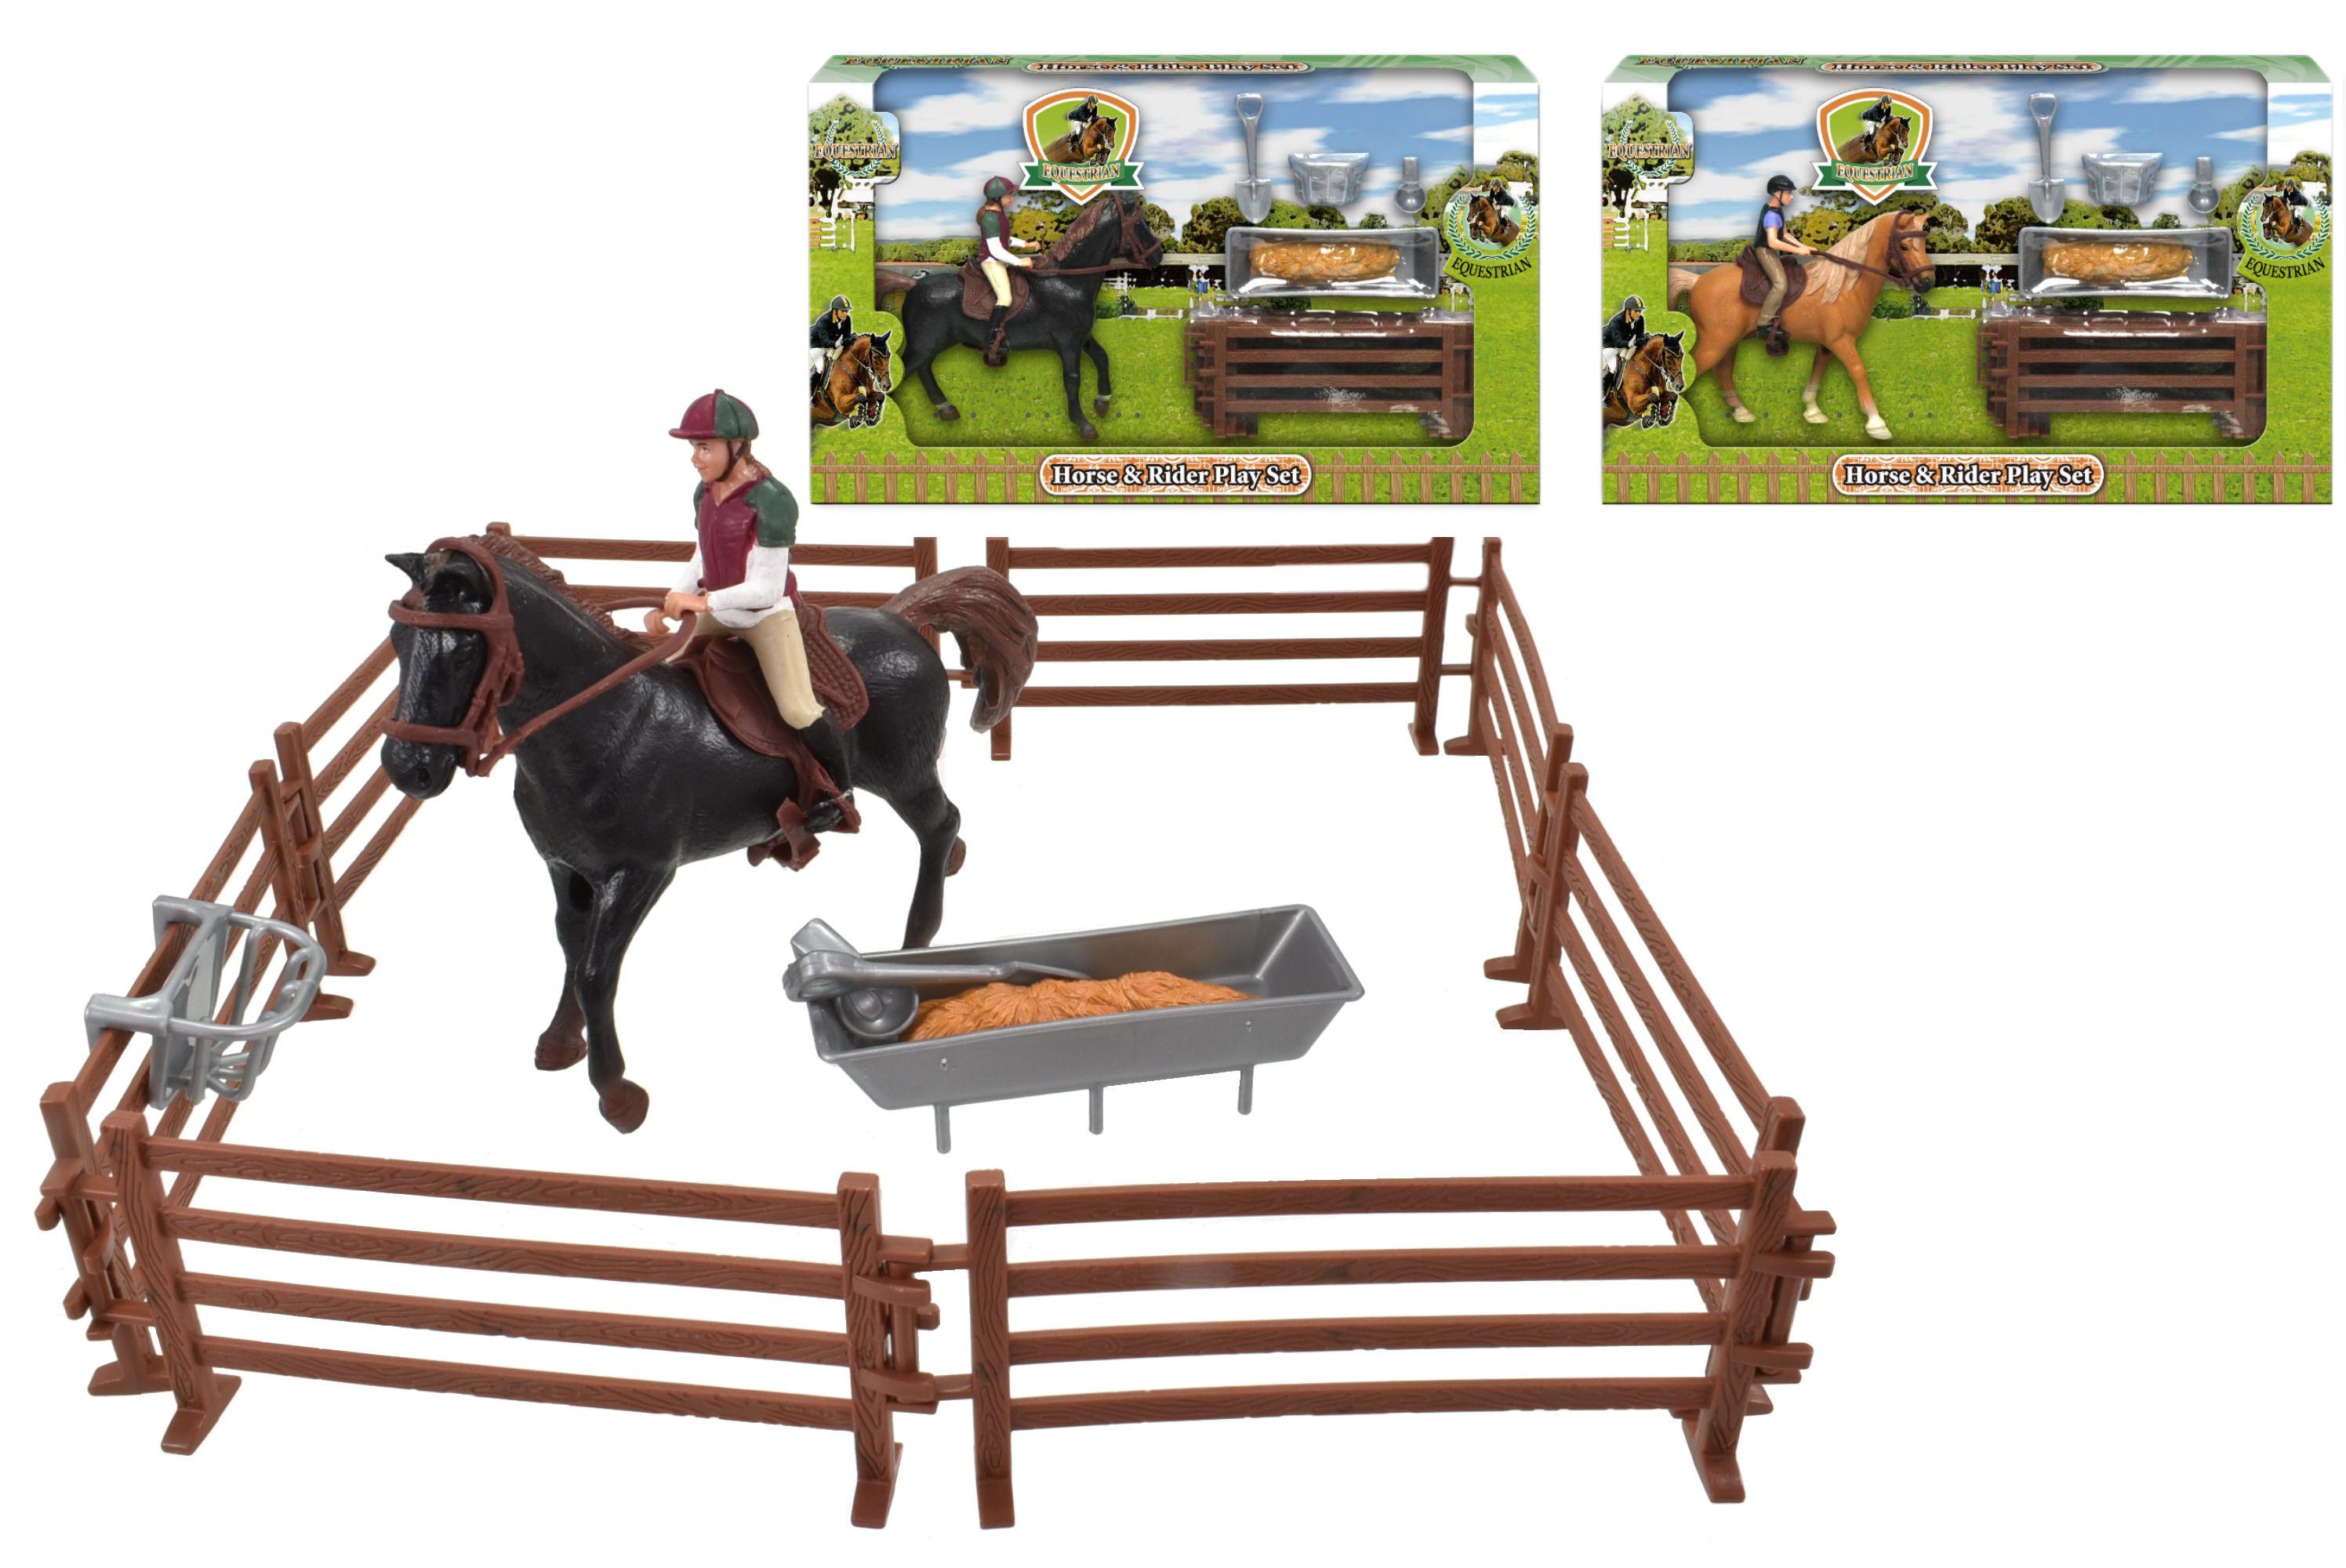 Horse & Rider Playset (2 Assorted)